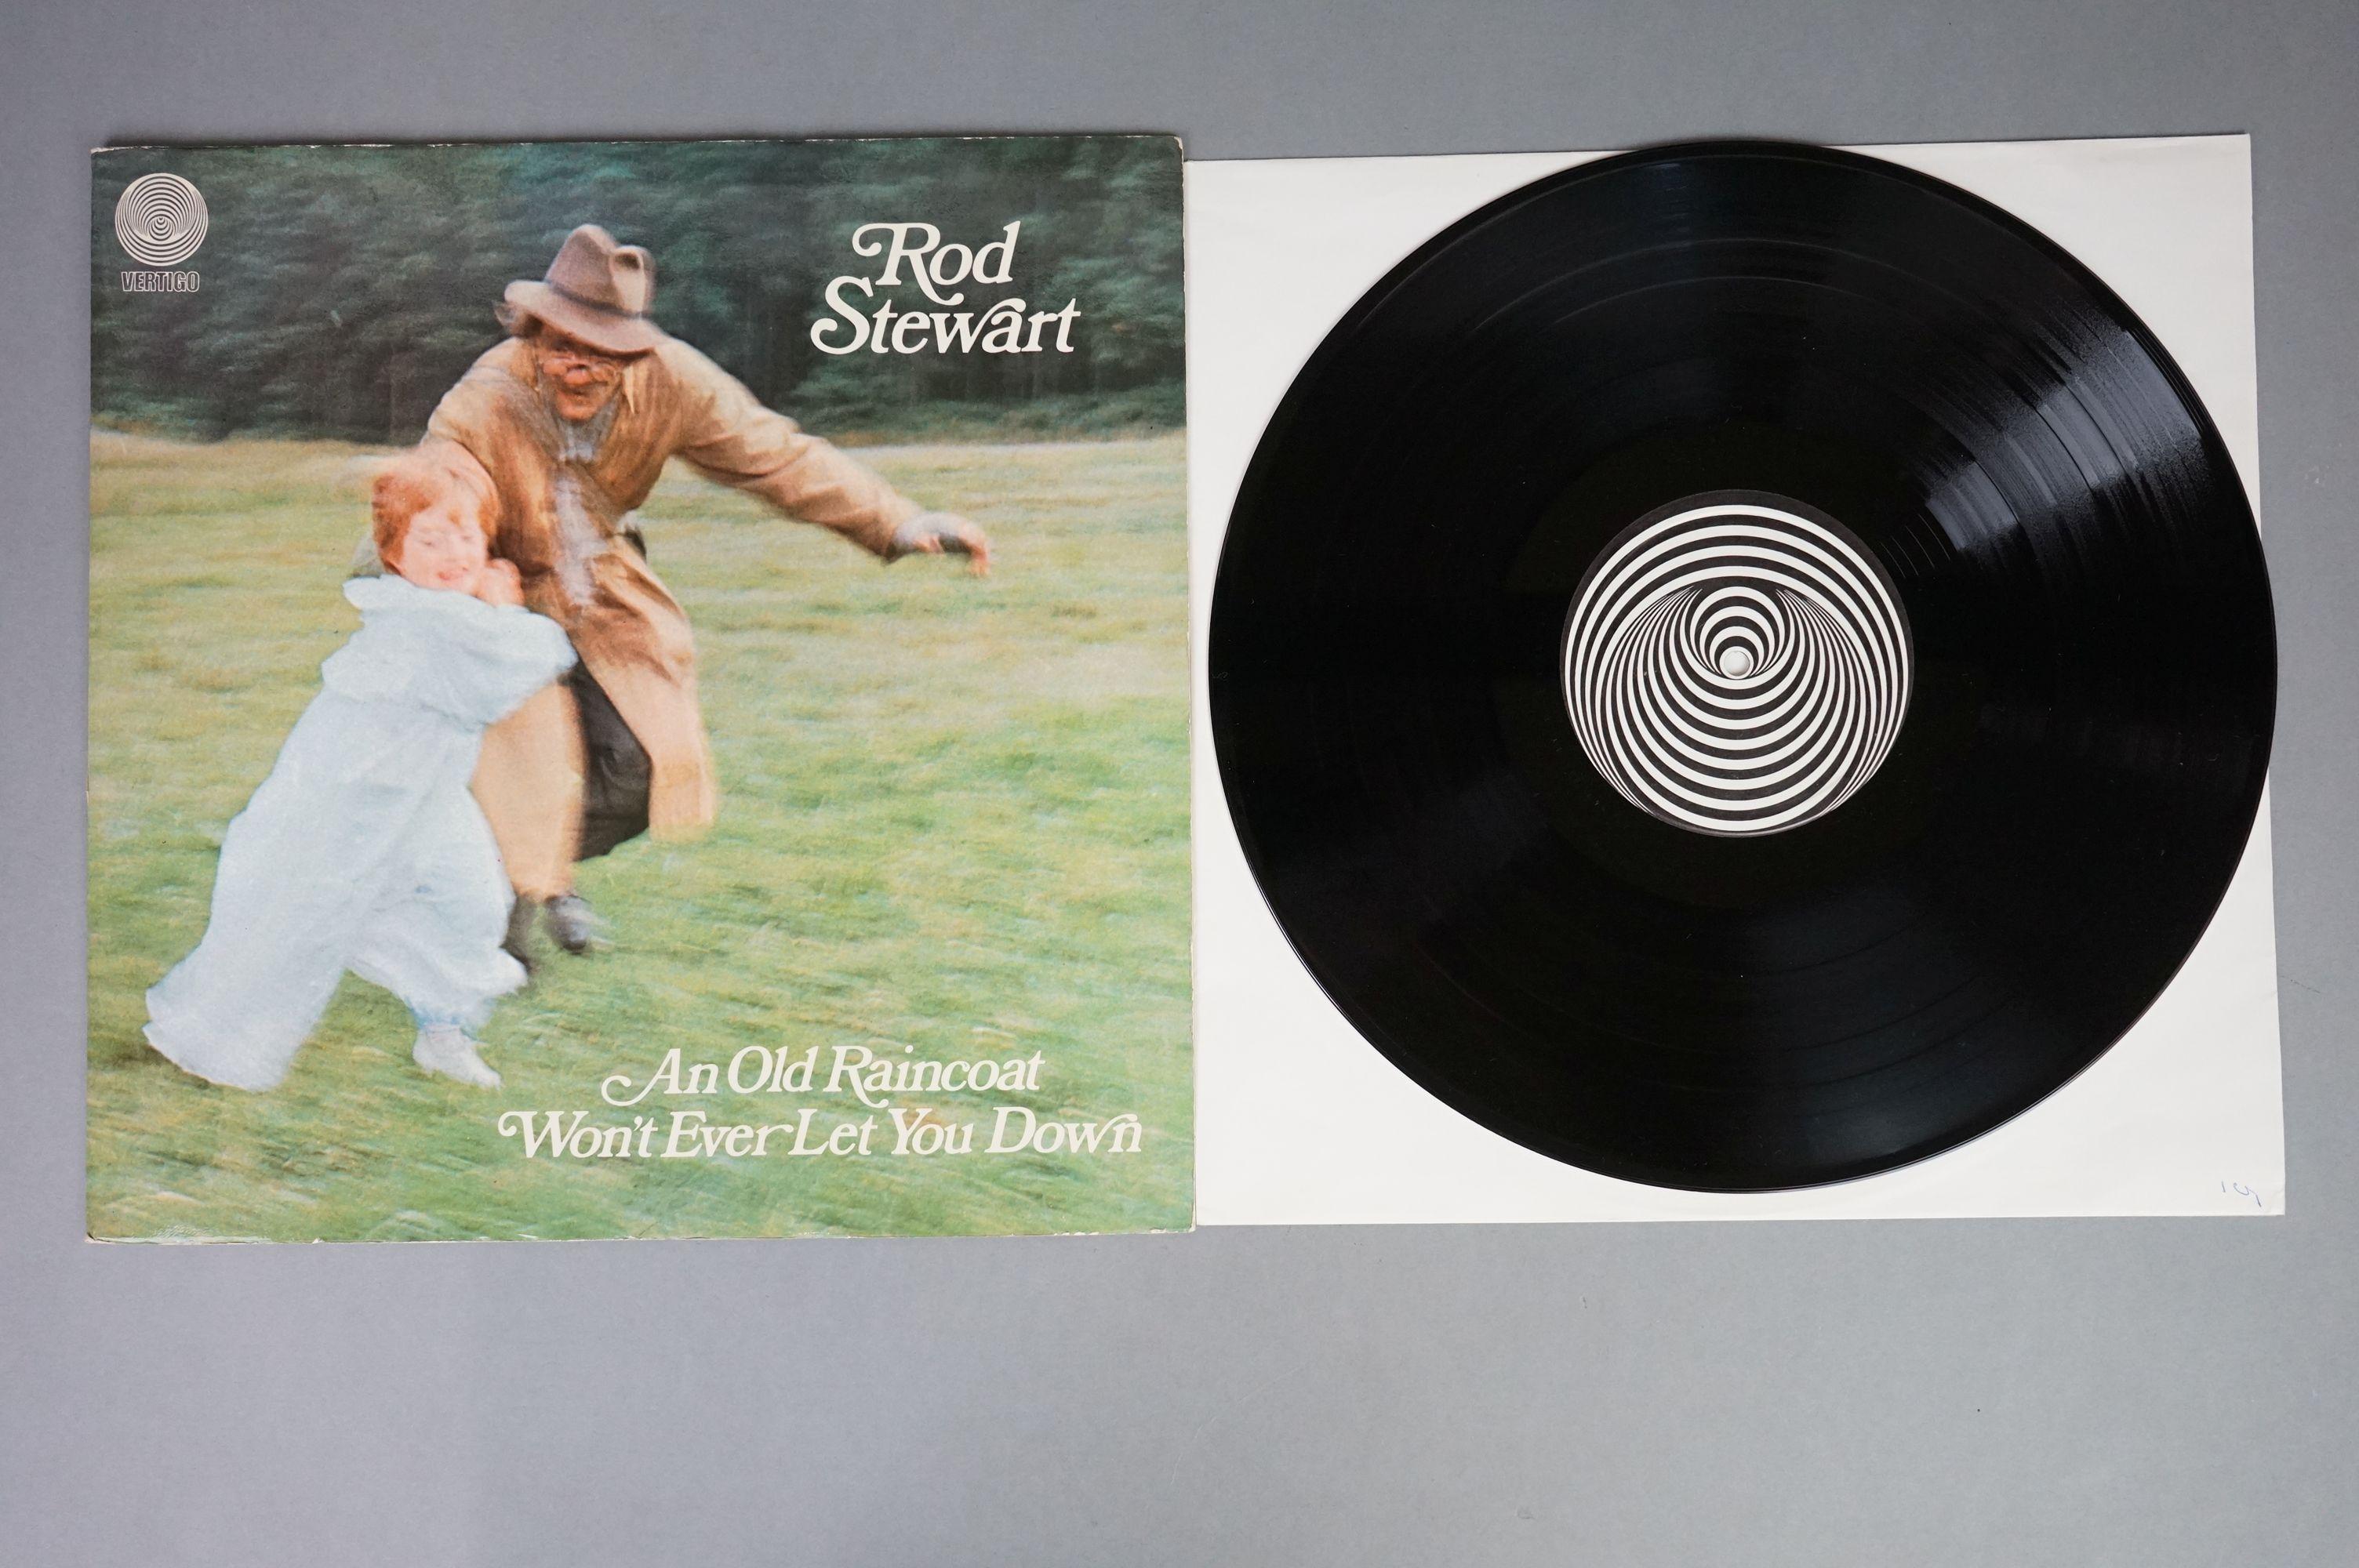 Vinyl - Rod Stewart 4 LP's to include An Old Raincoat Won't Ever Let You Down (Vertigo VO4) gatefold - Image 12 of 14